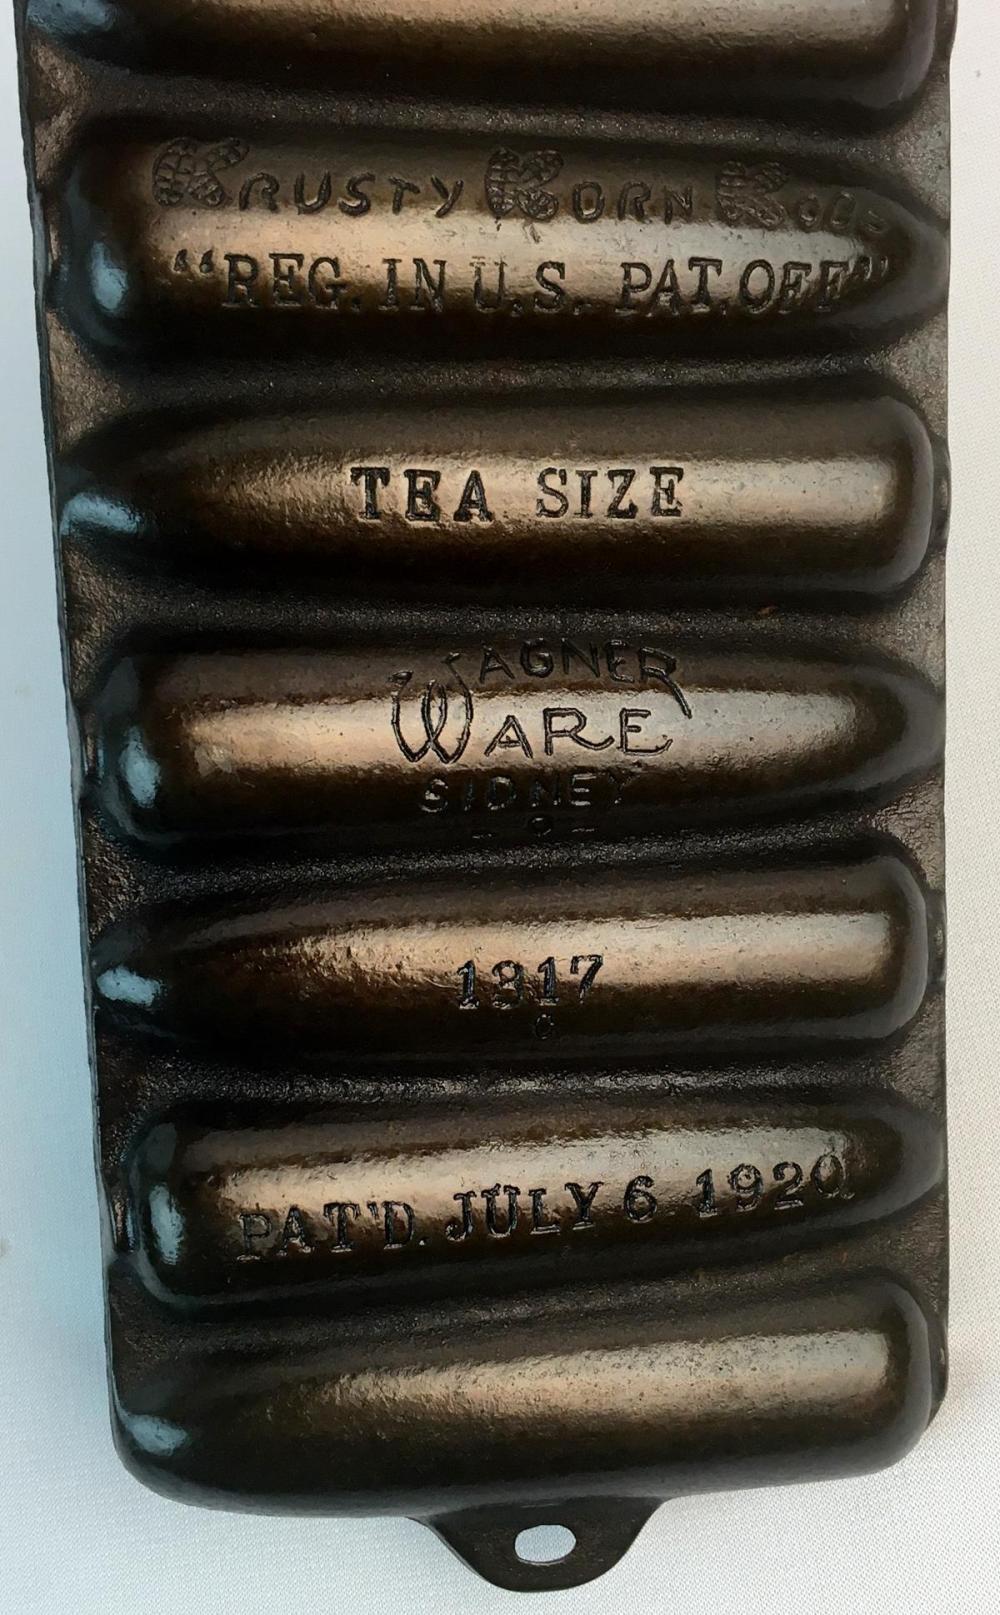 Antique 1920 Wagner Ware Sidney -O- Cast Iron Krusty Korn Kobs Tea Size Corn Bread Pan 1317 C w/ 7 Forms